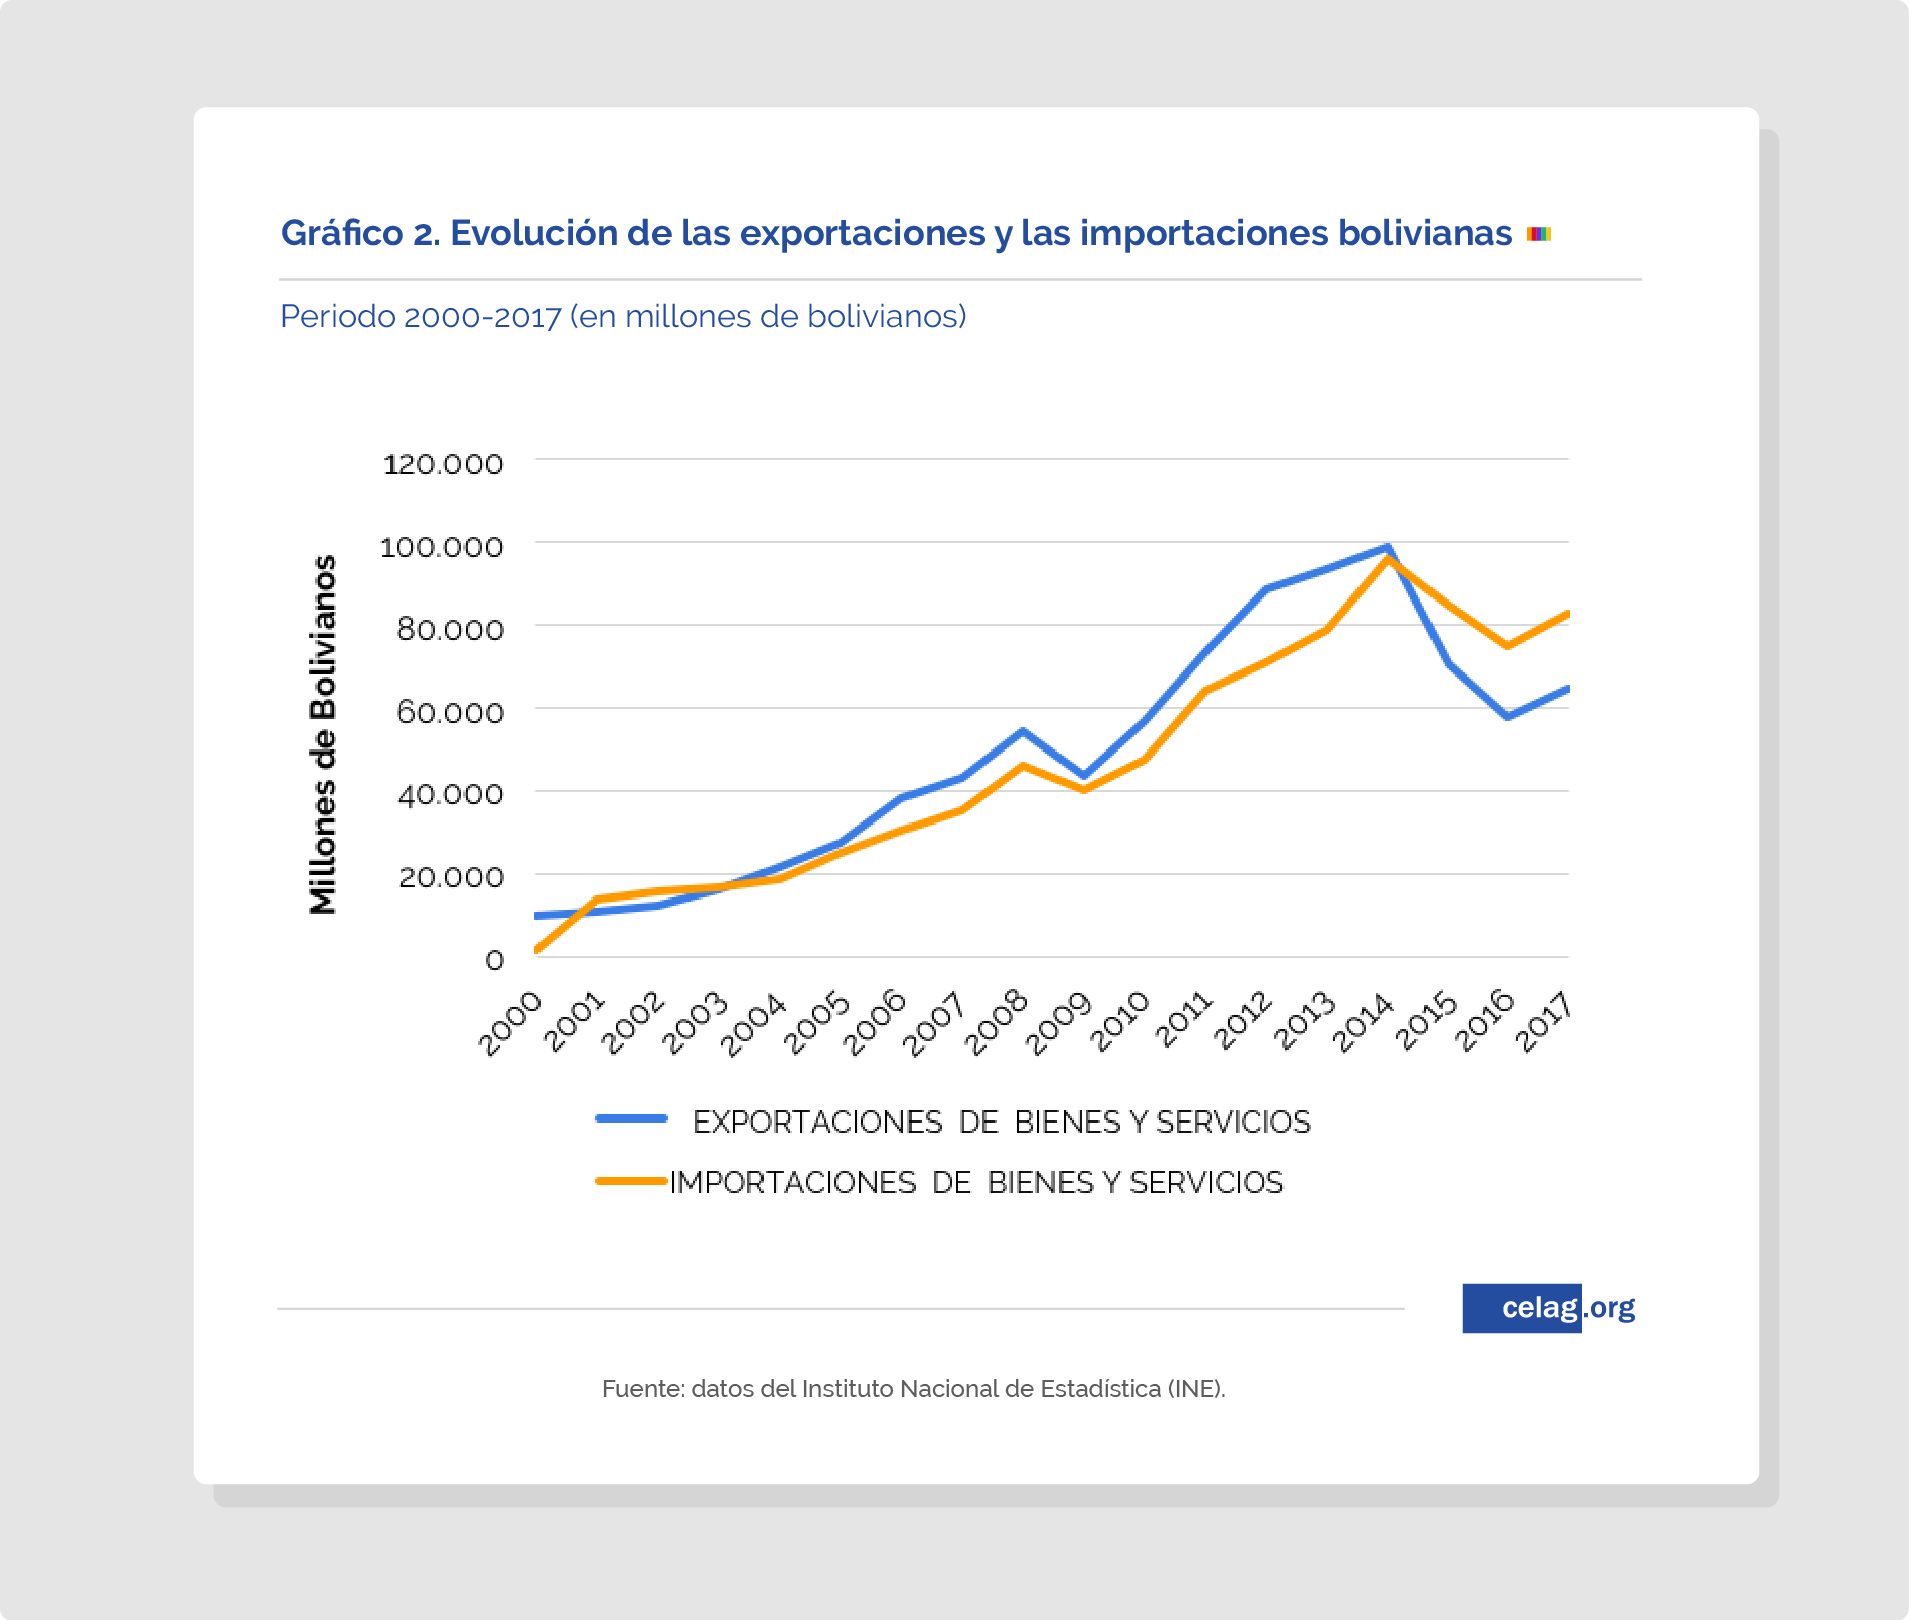 Gráfico 2. Situación económica Bolivia